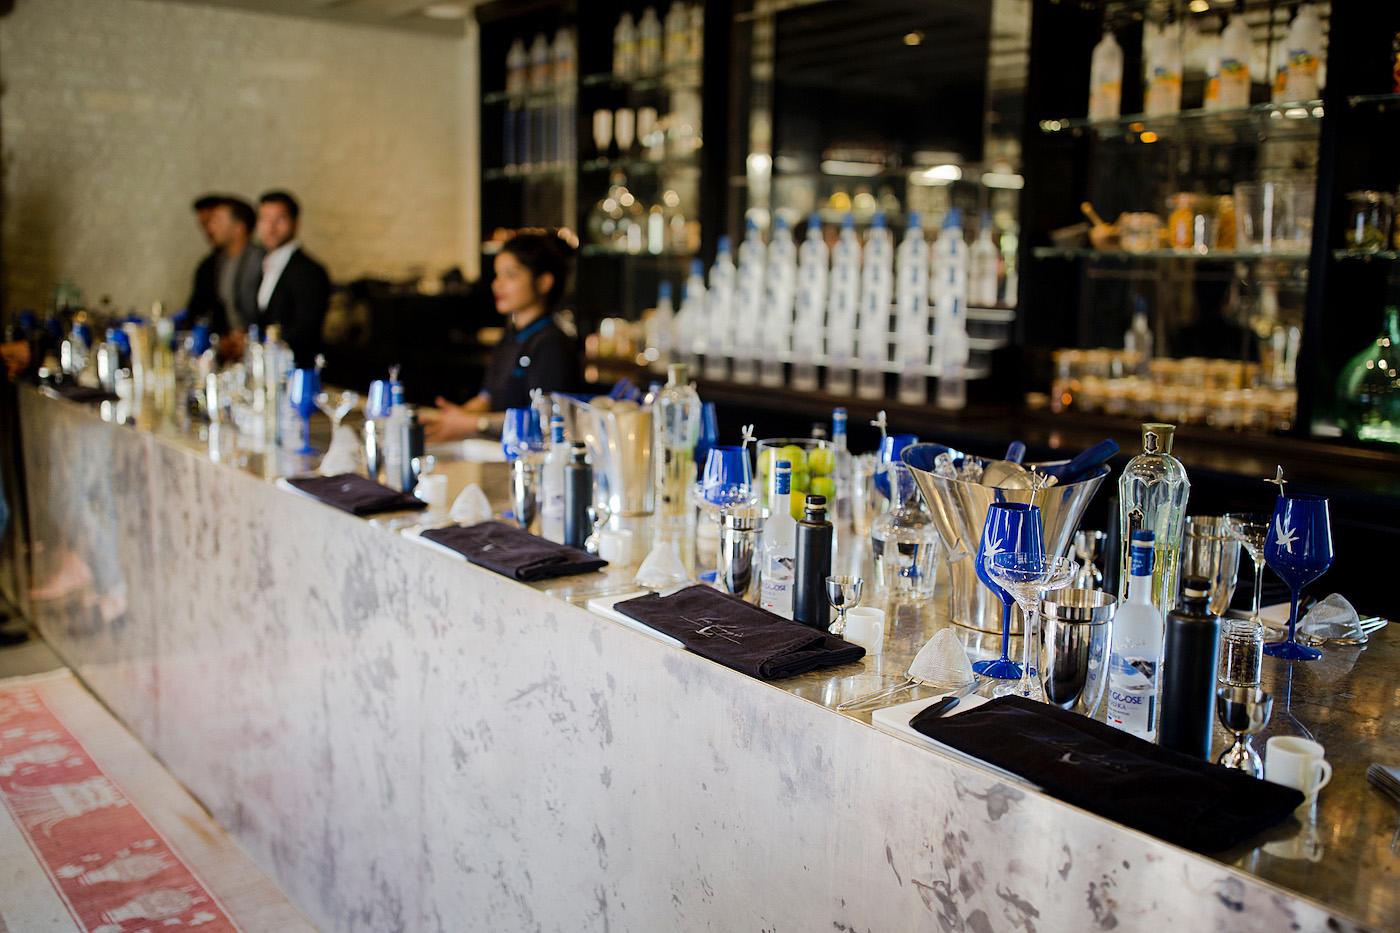 wwww.thegoldenbun.com |le logis grey goose vodka cognac francois thibault